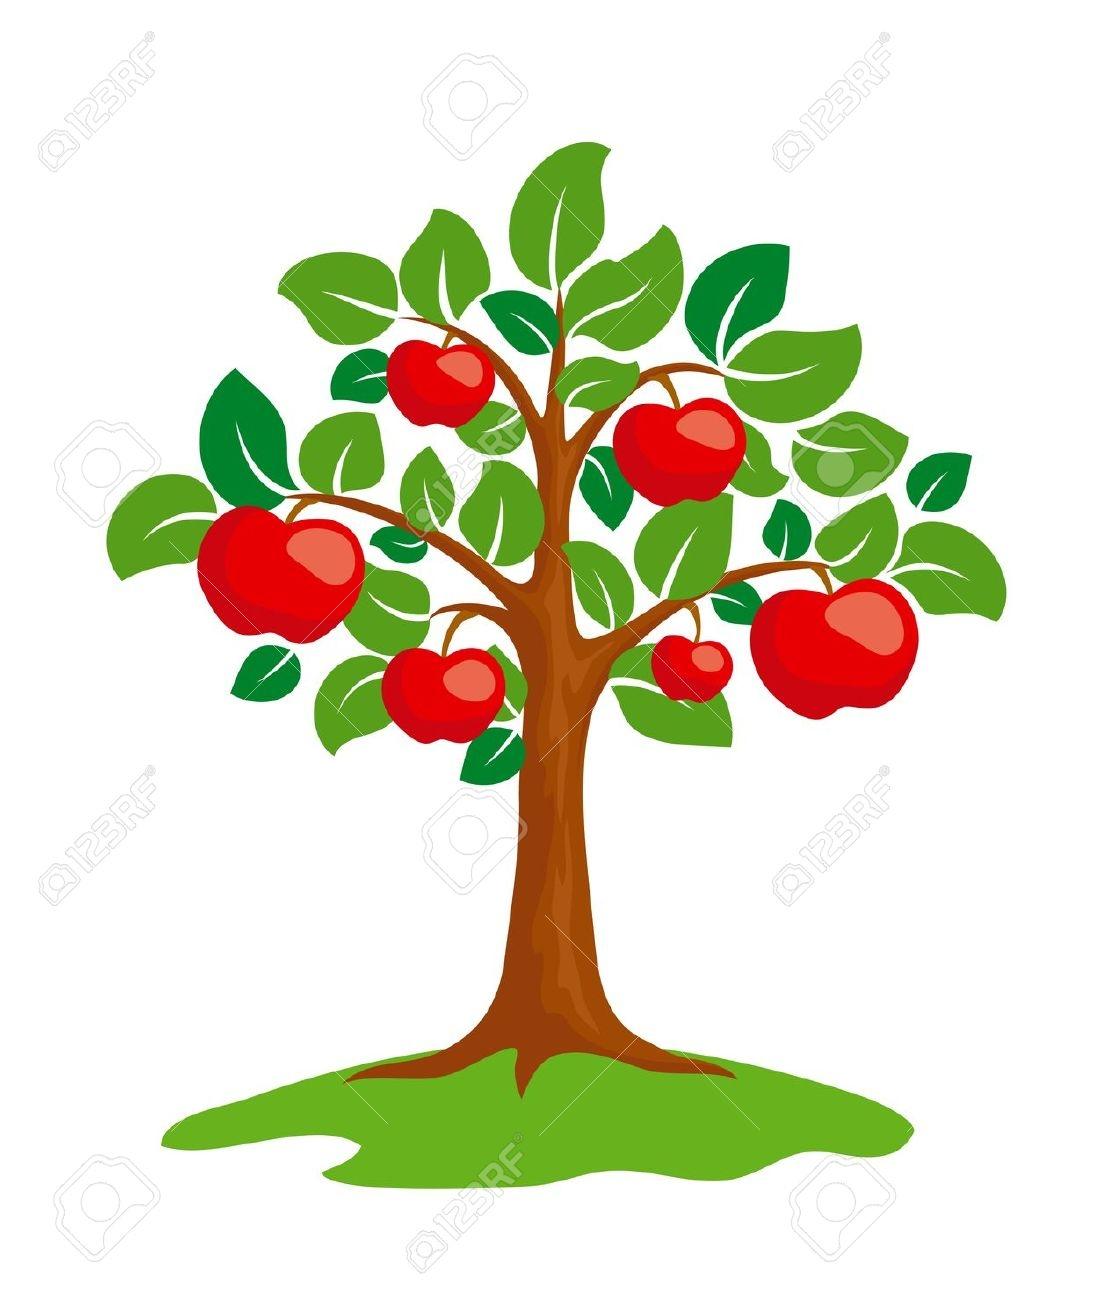 Apple Tree Clipart - .